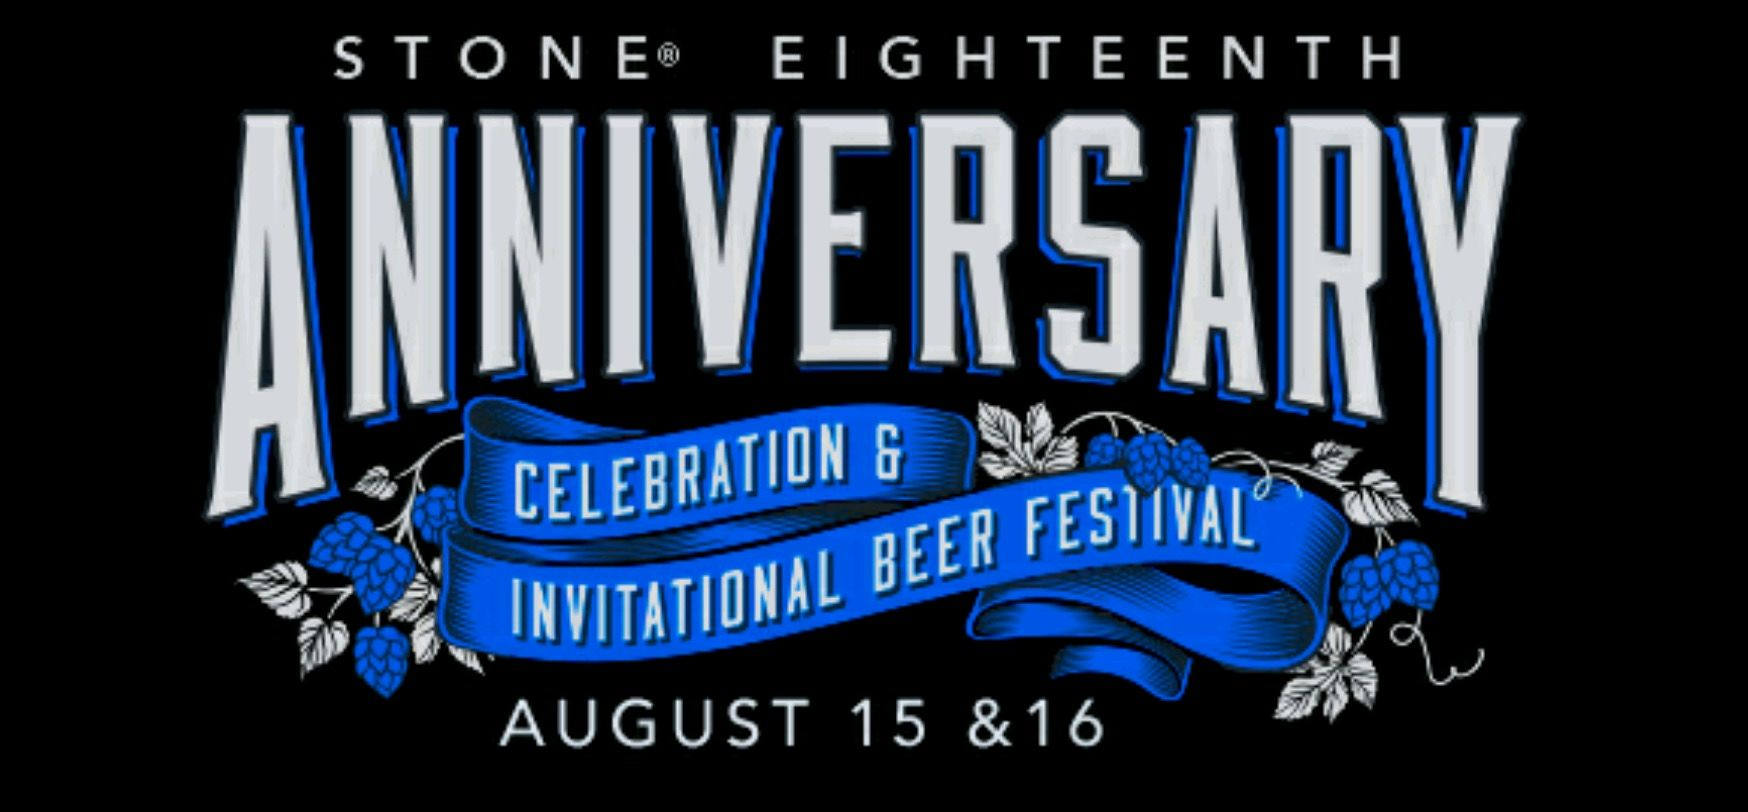 Stone 18th Anniversary Celebration & Invitational Beer